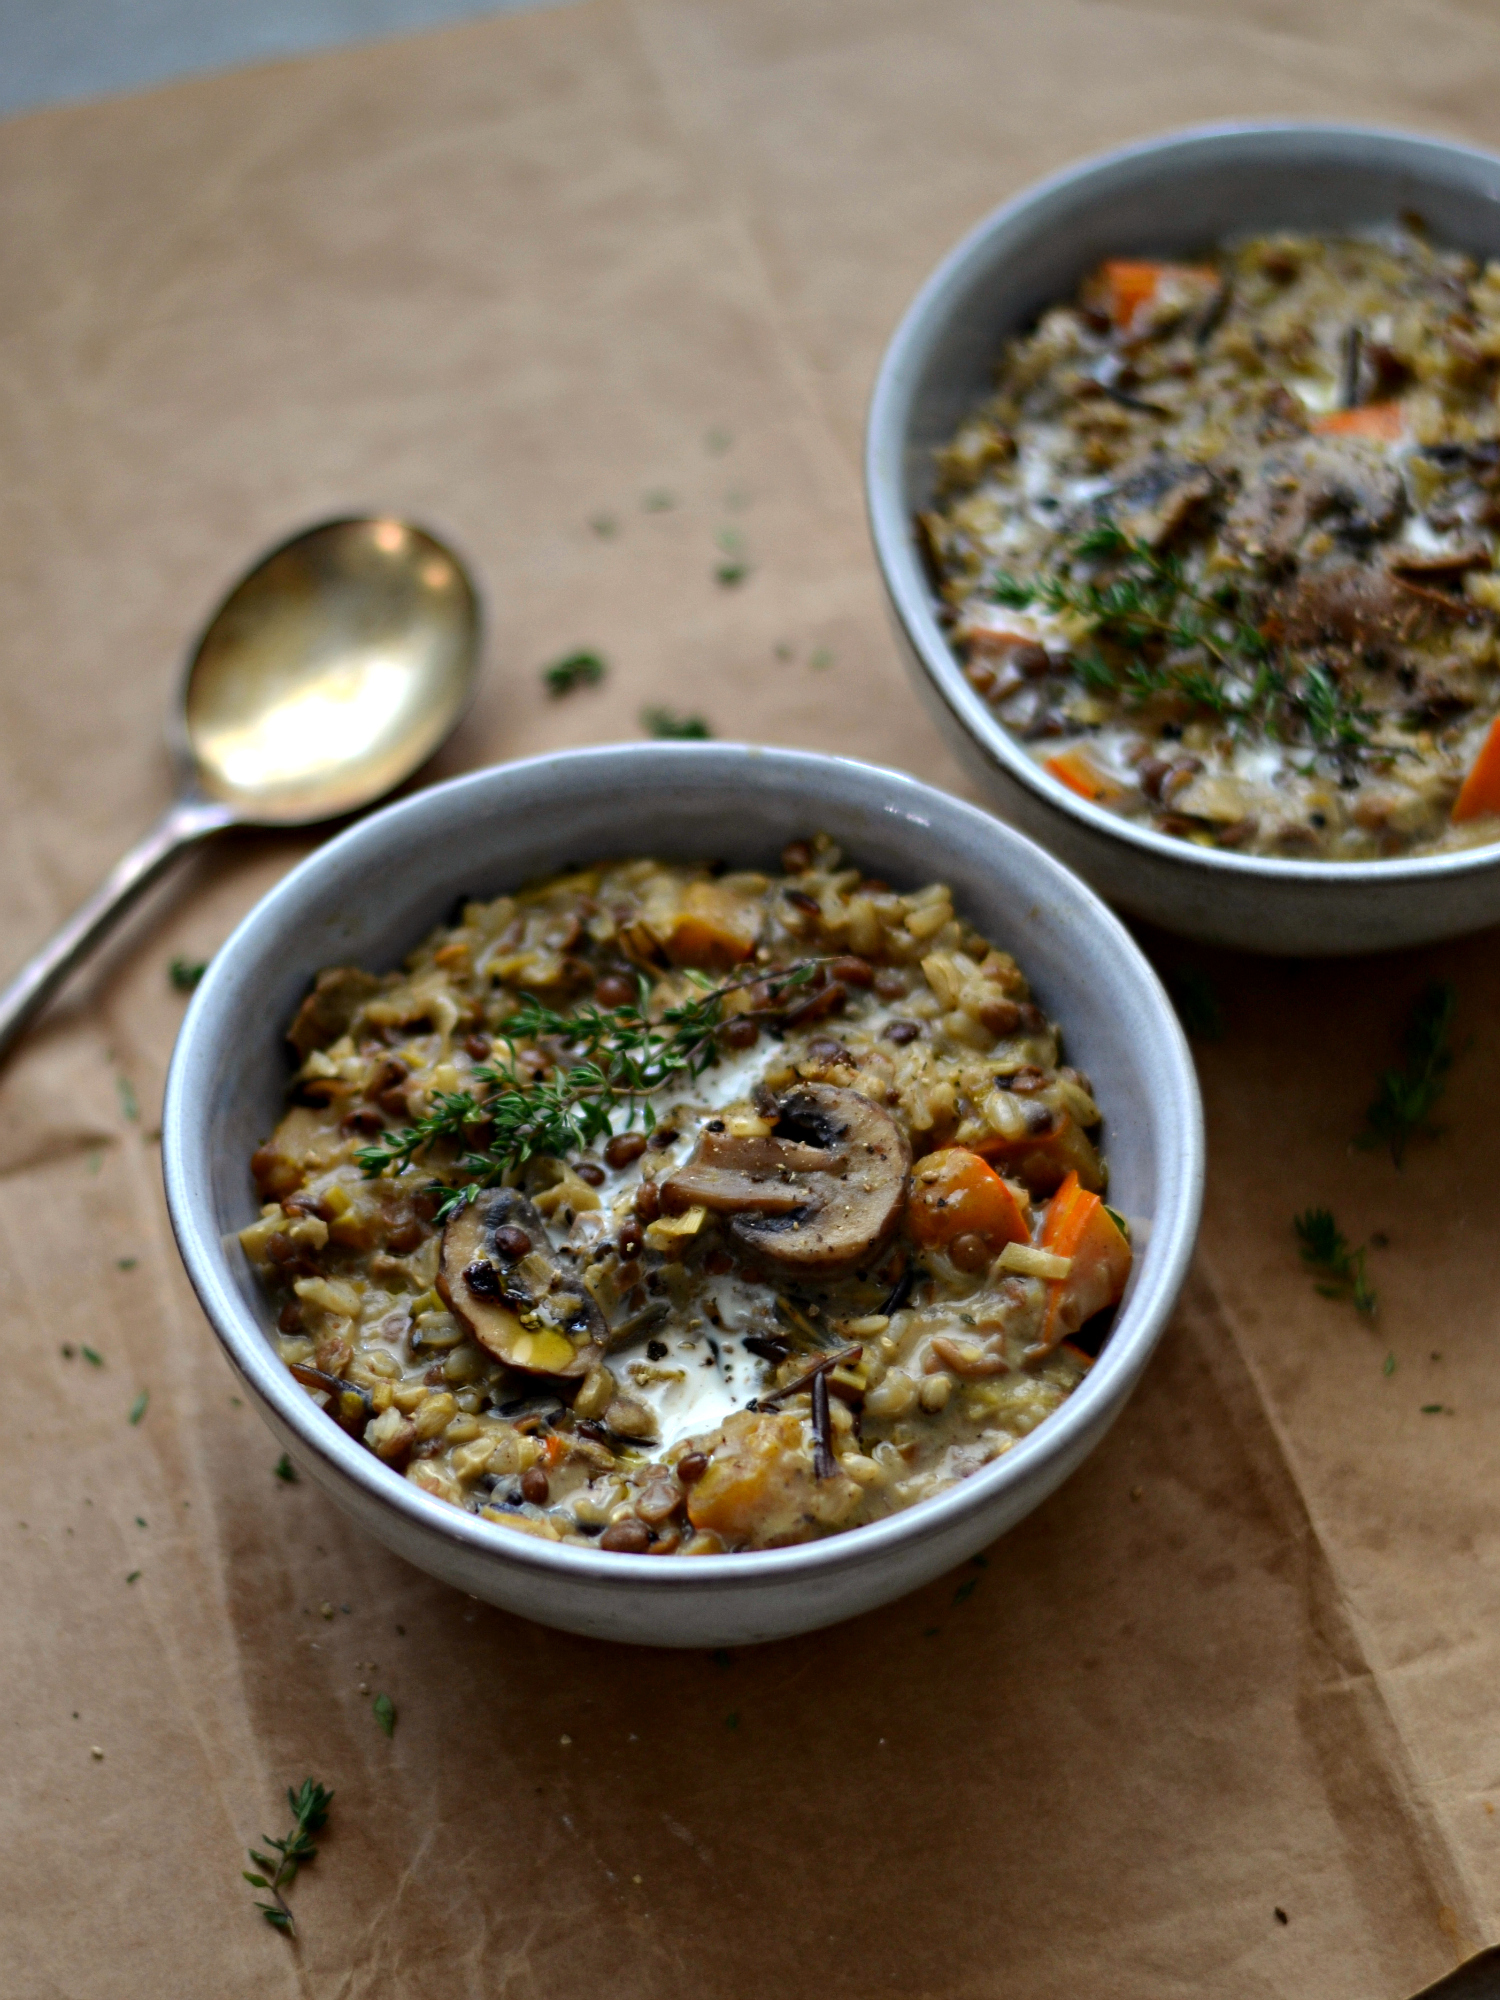 Estufado de lentilhas, arroz selvagem e cogumelos